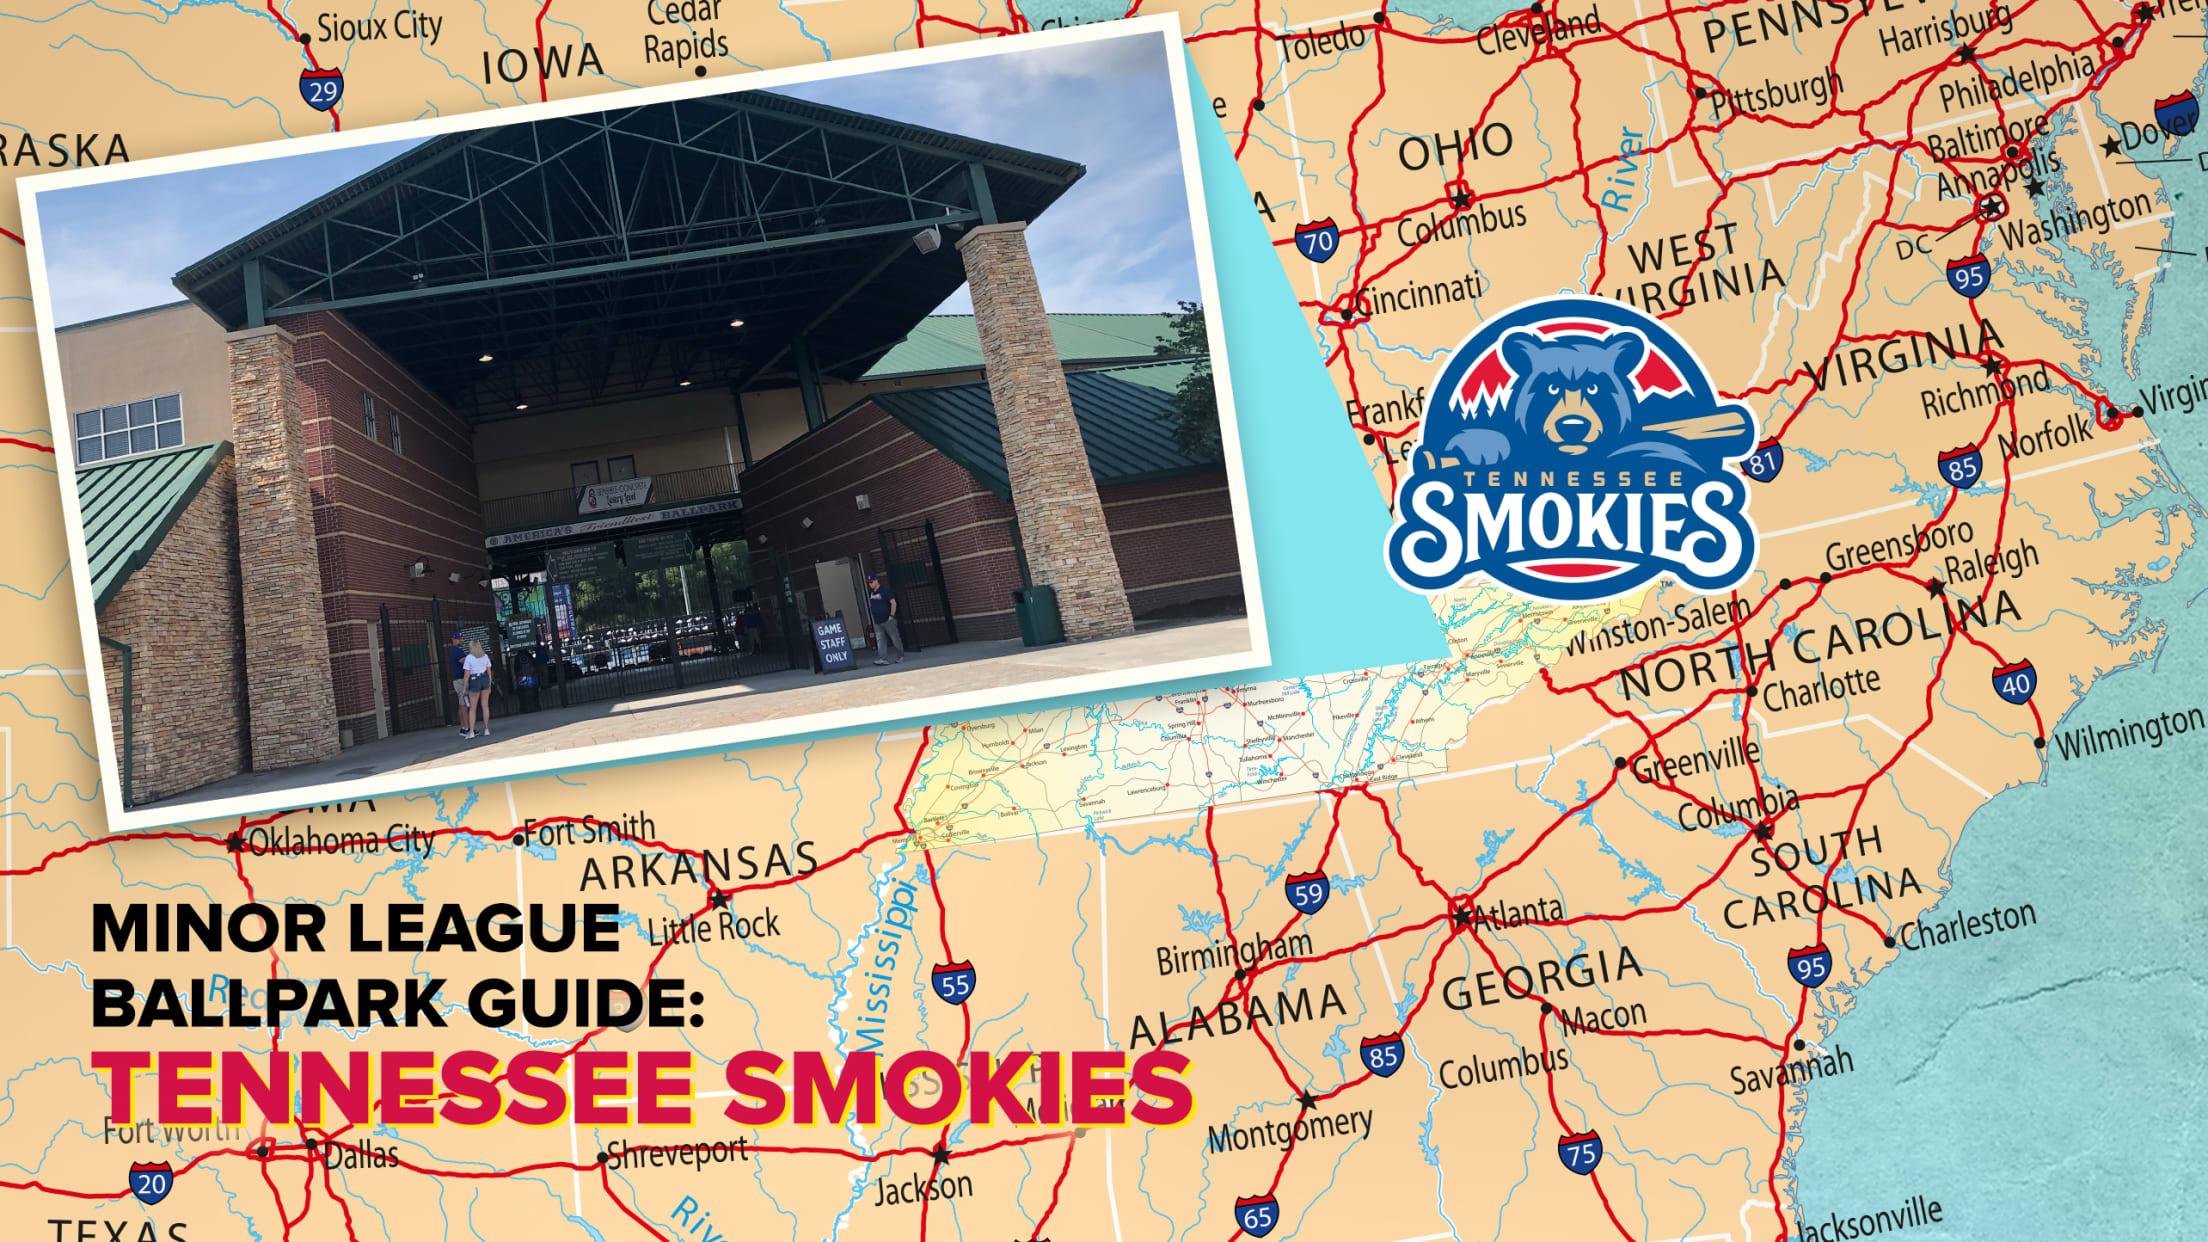 2568x1445-Stadium_Map_Tennessee_Smokies